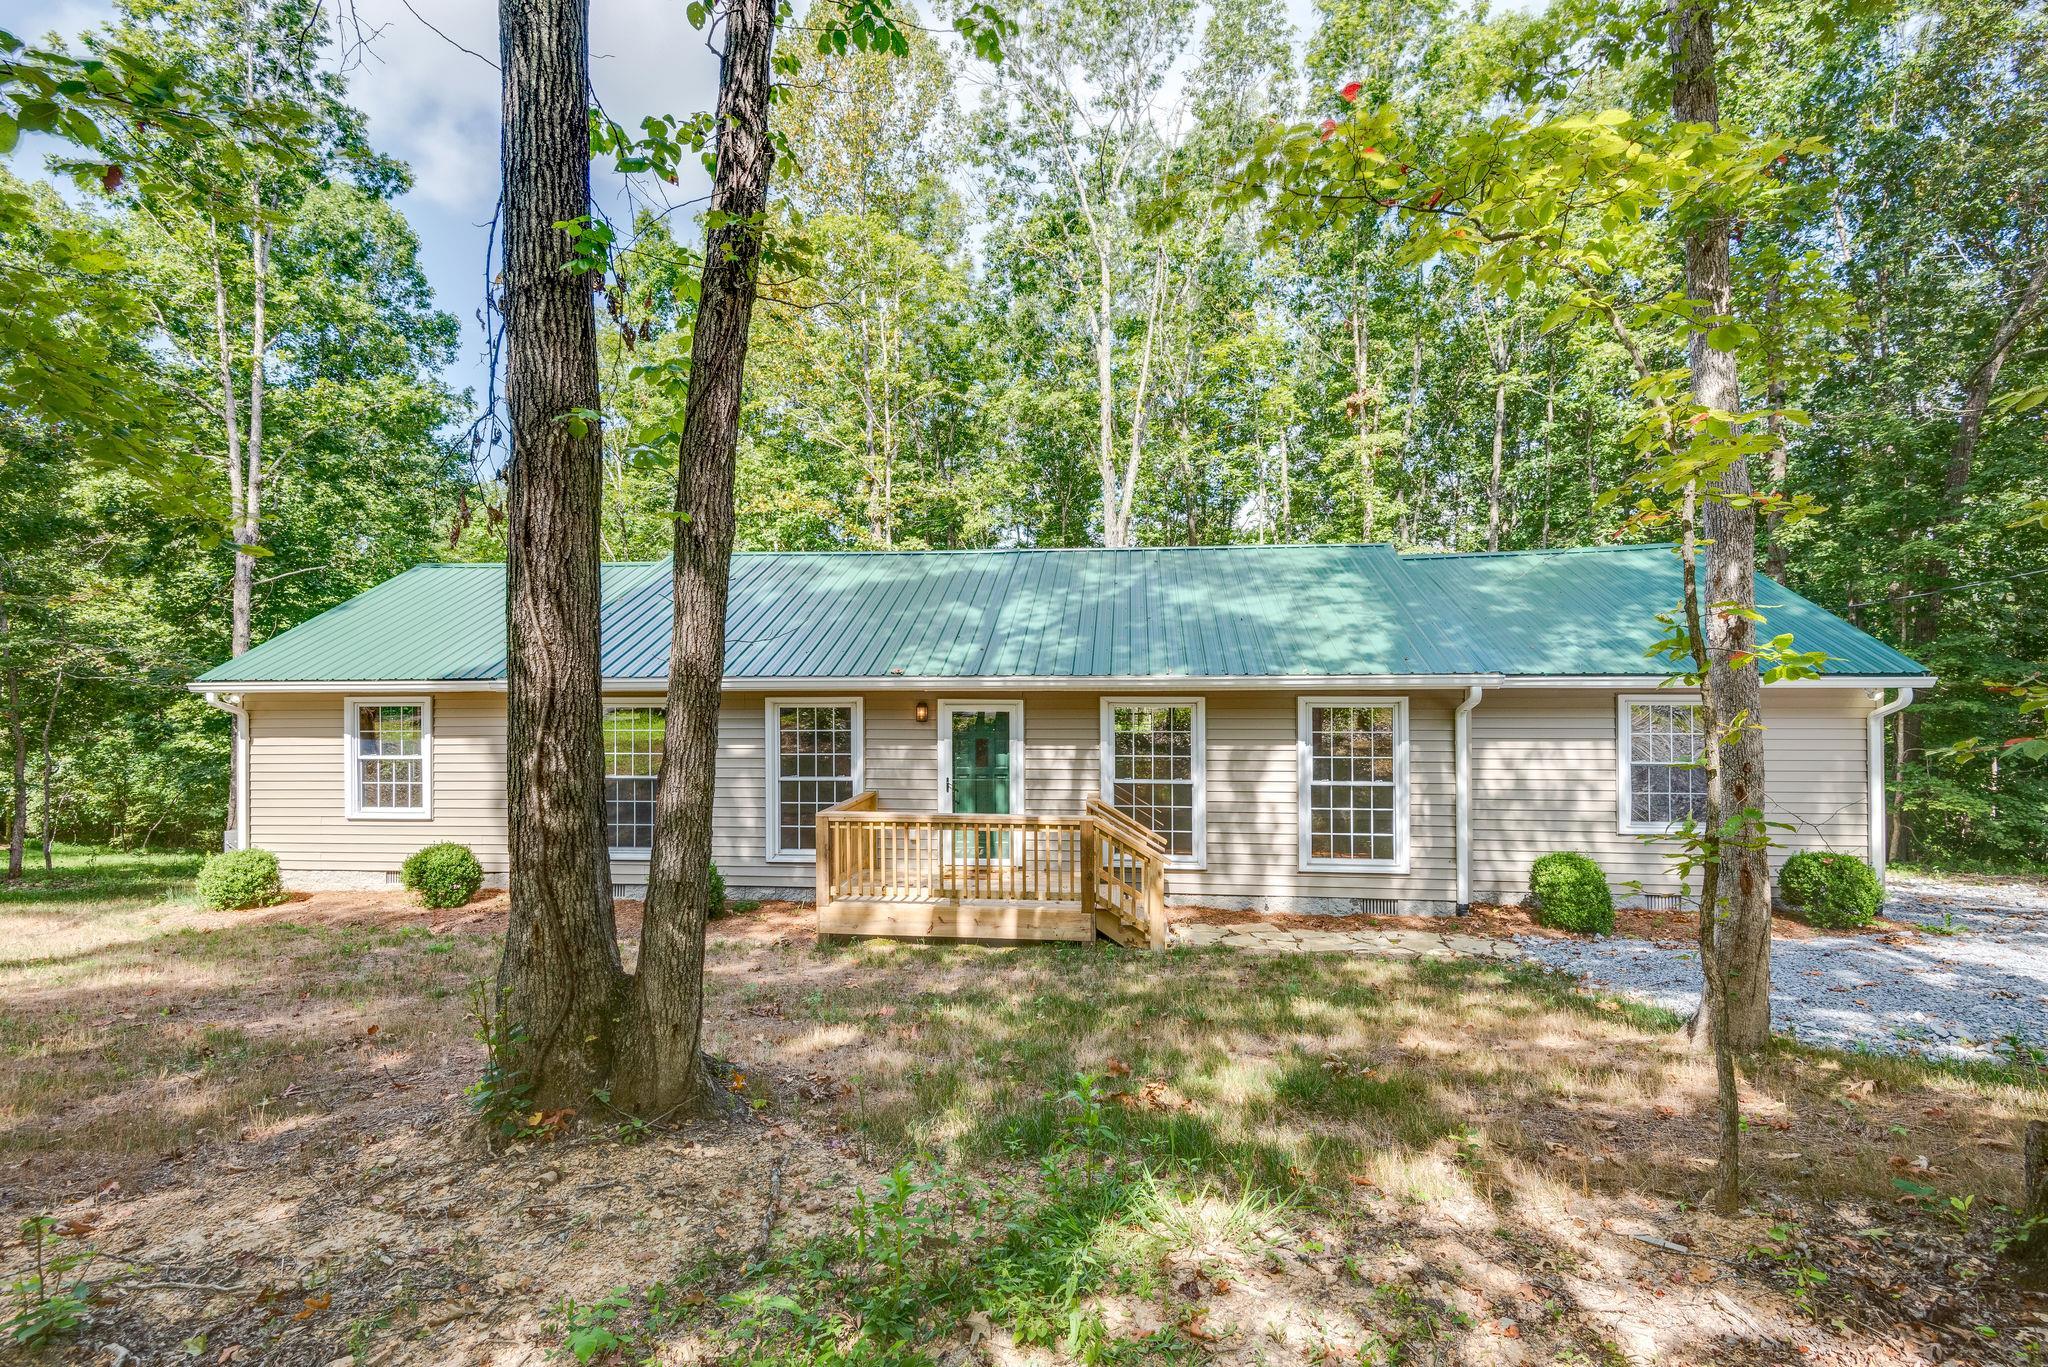 1077 Overlook Trl, Kingston Springs, TN 37082 - Kingston Springs, TN real estate listing